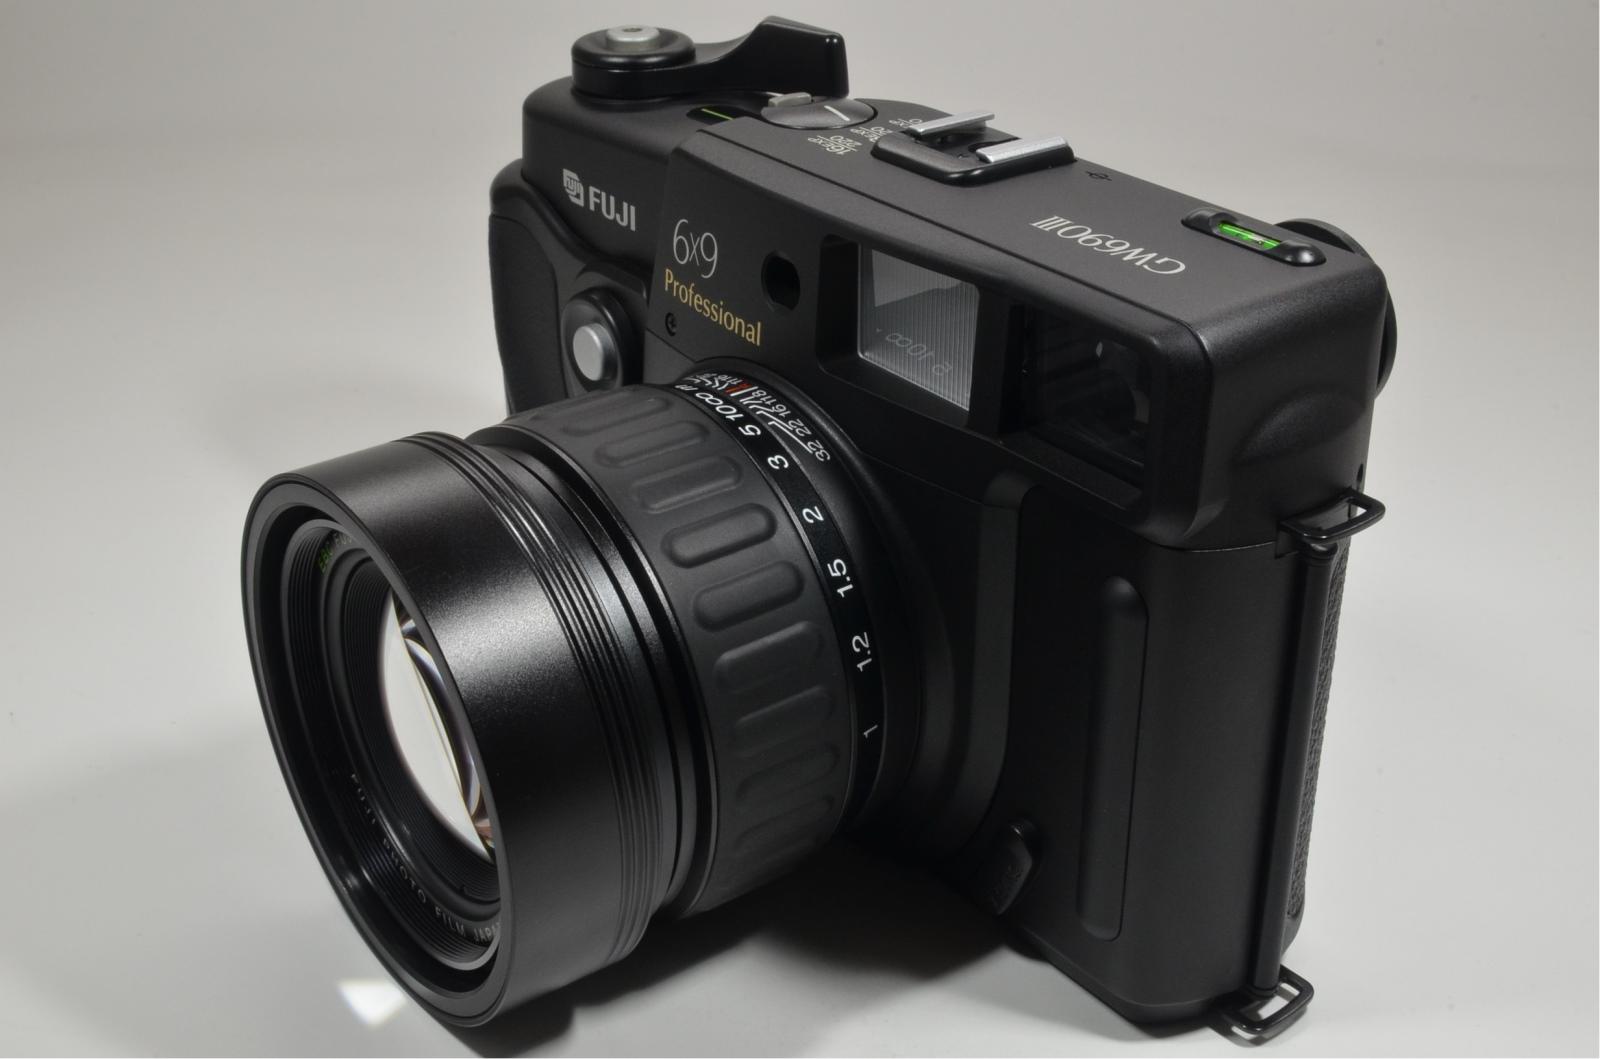 fuji fujifilm gw690iii 90mm f3.5 medium format count only '011' very rare!